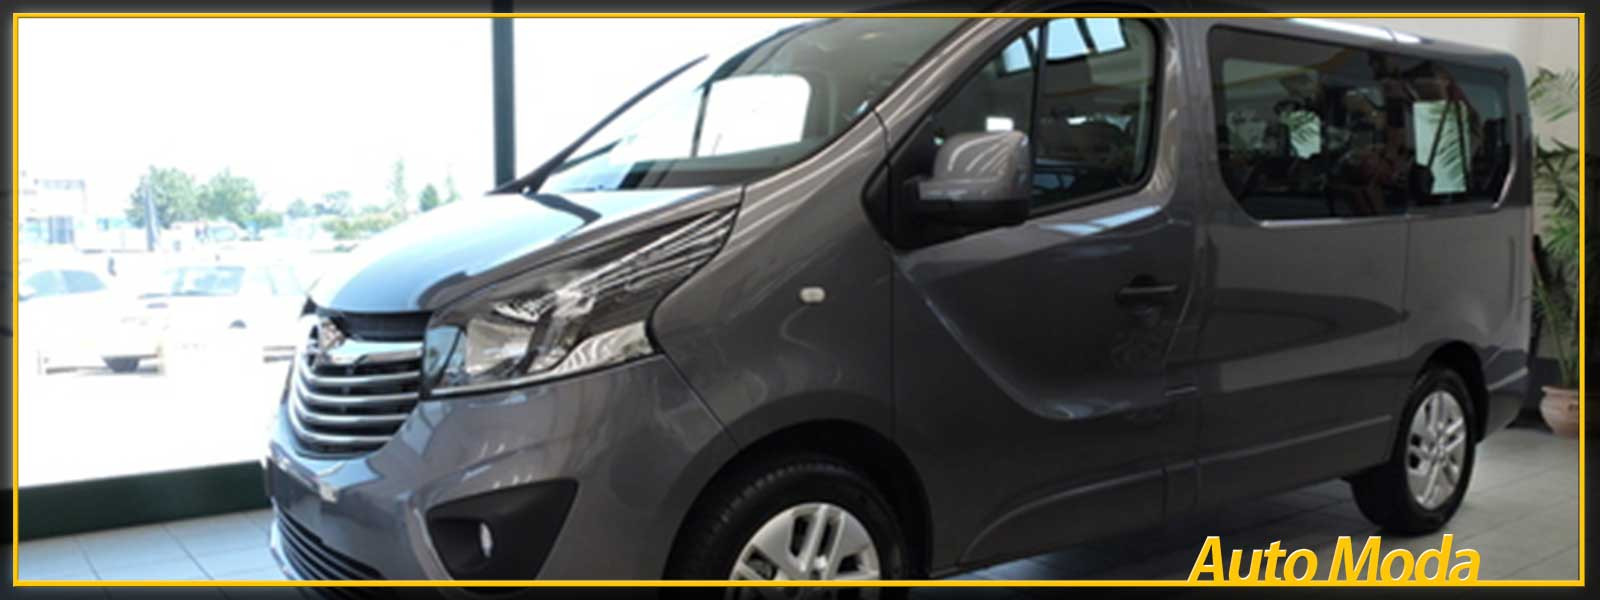 Opel vivaro nuovo opel vivaro nuovo opel vivaro per for Brinkley manor apartments floor plans